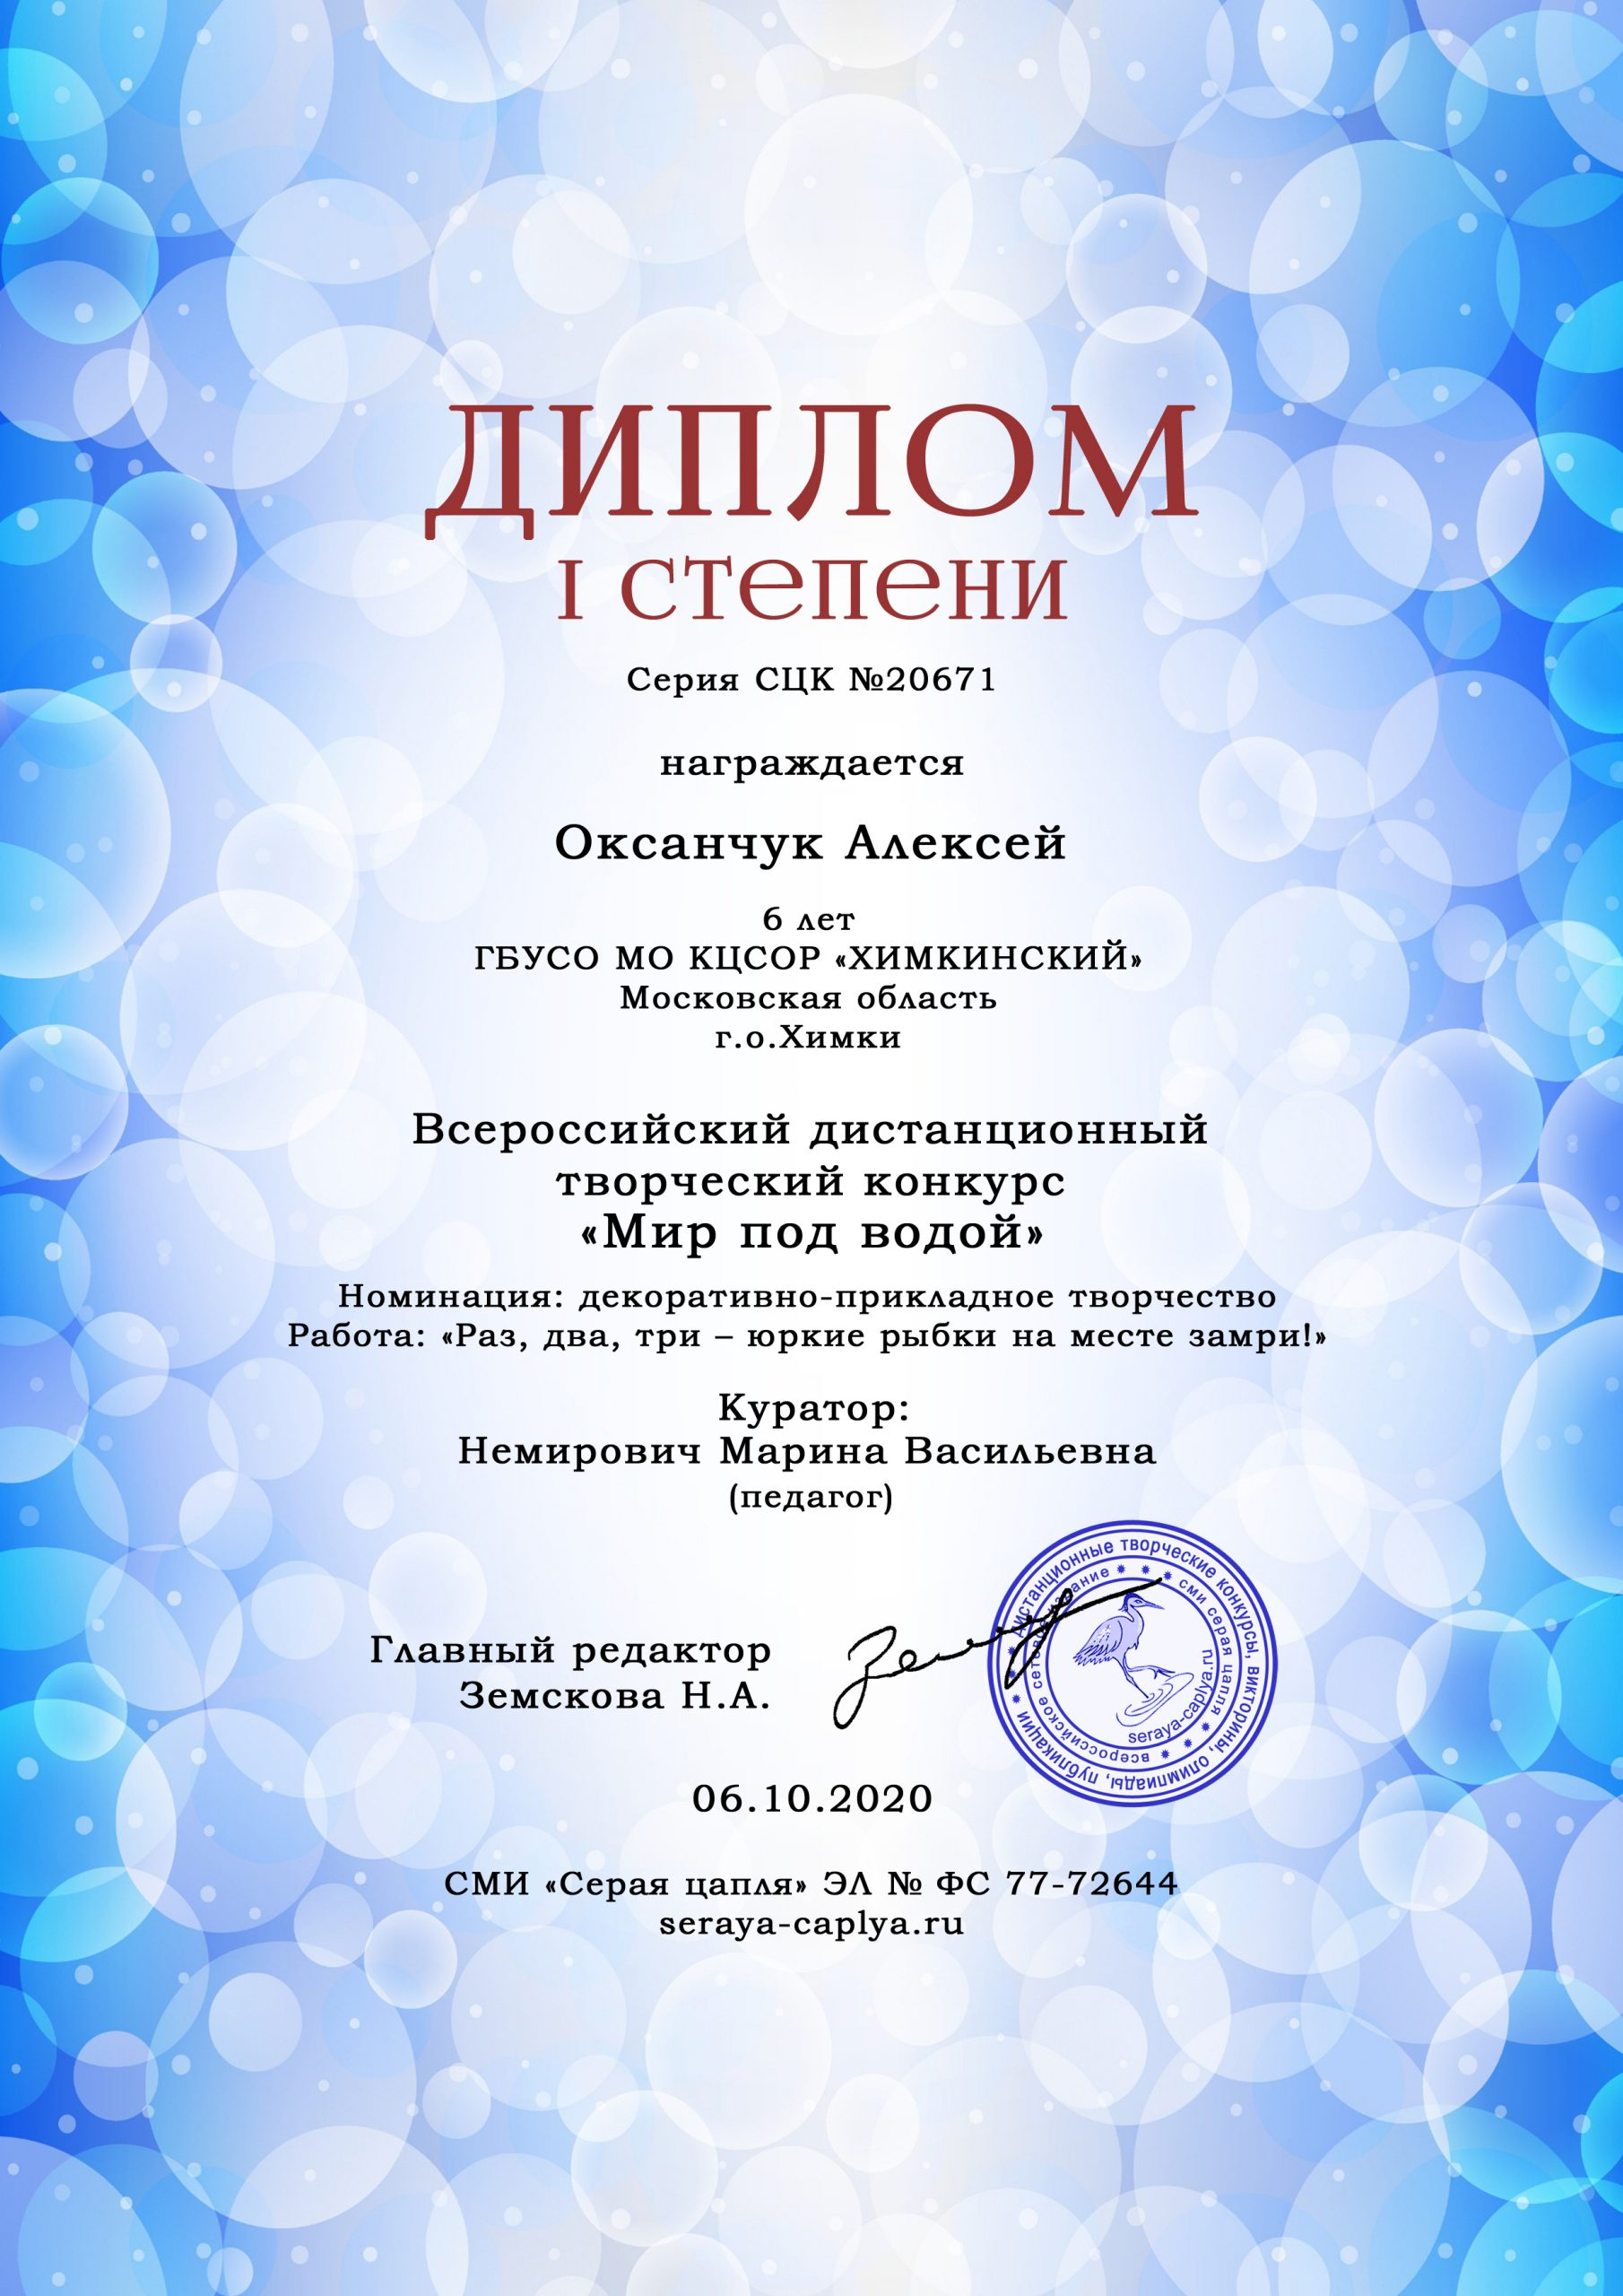 Оксанчук